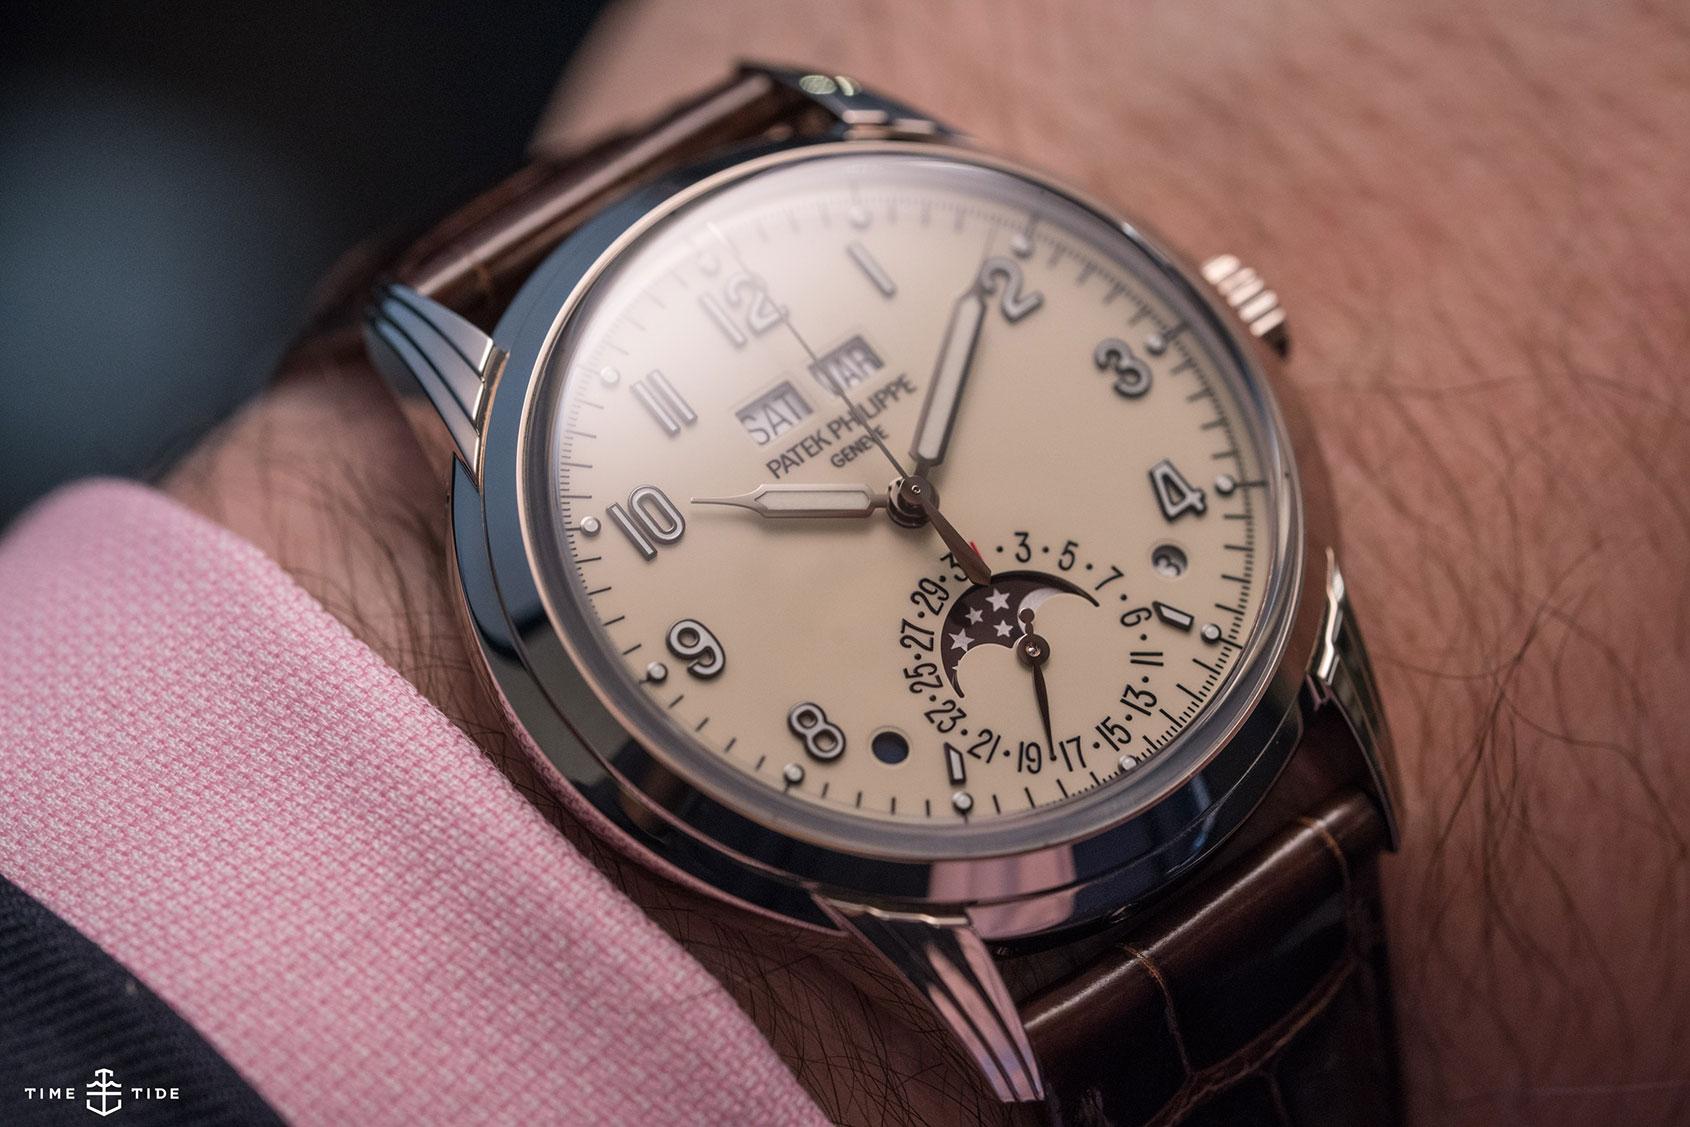 The case, the dial, the Patek Philippe ref. 5320G Perpetual Calendar